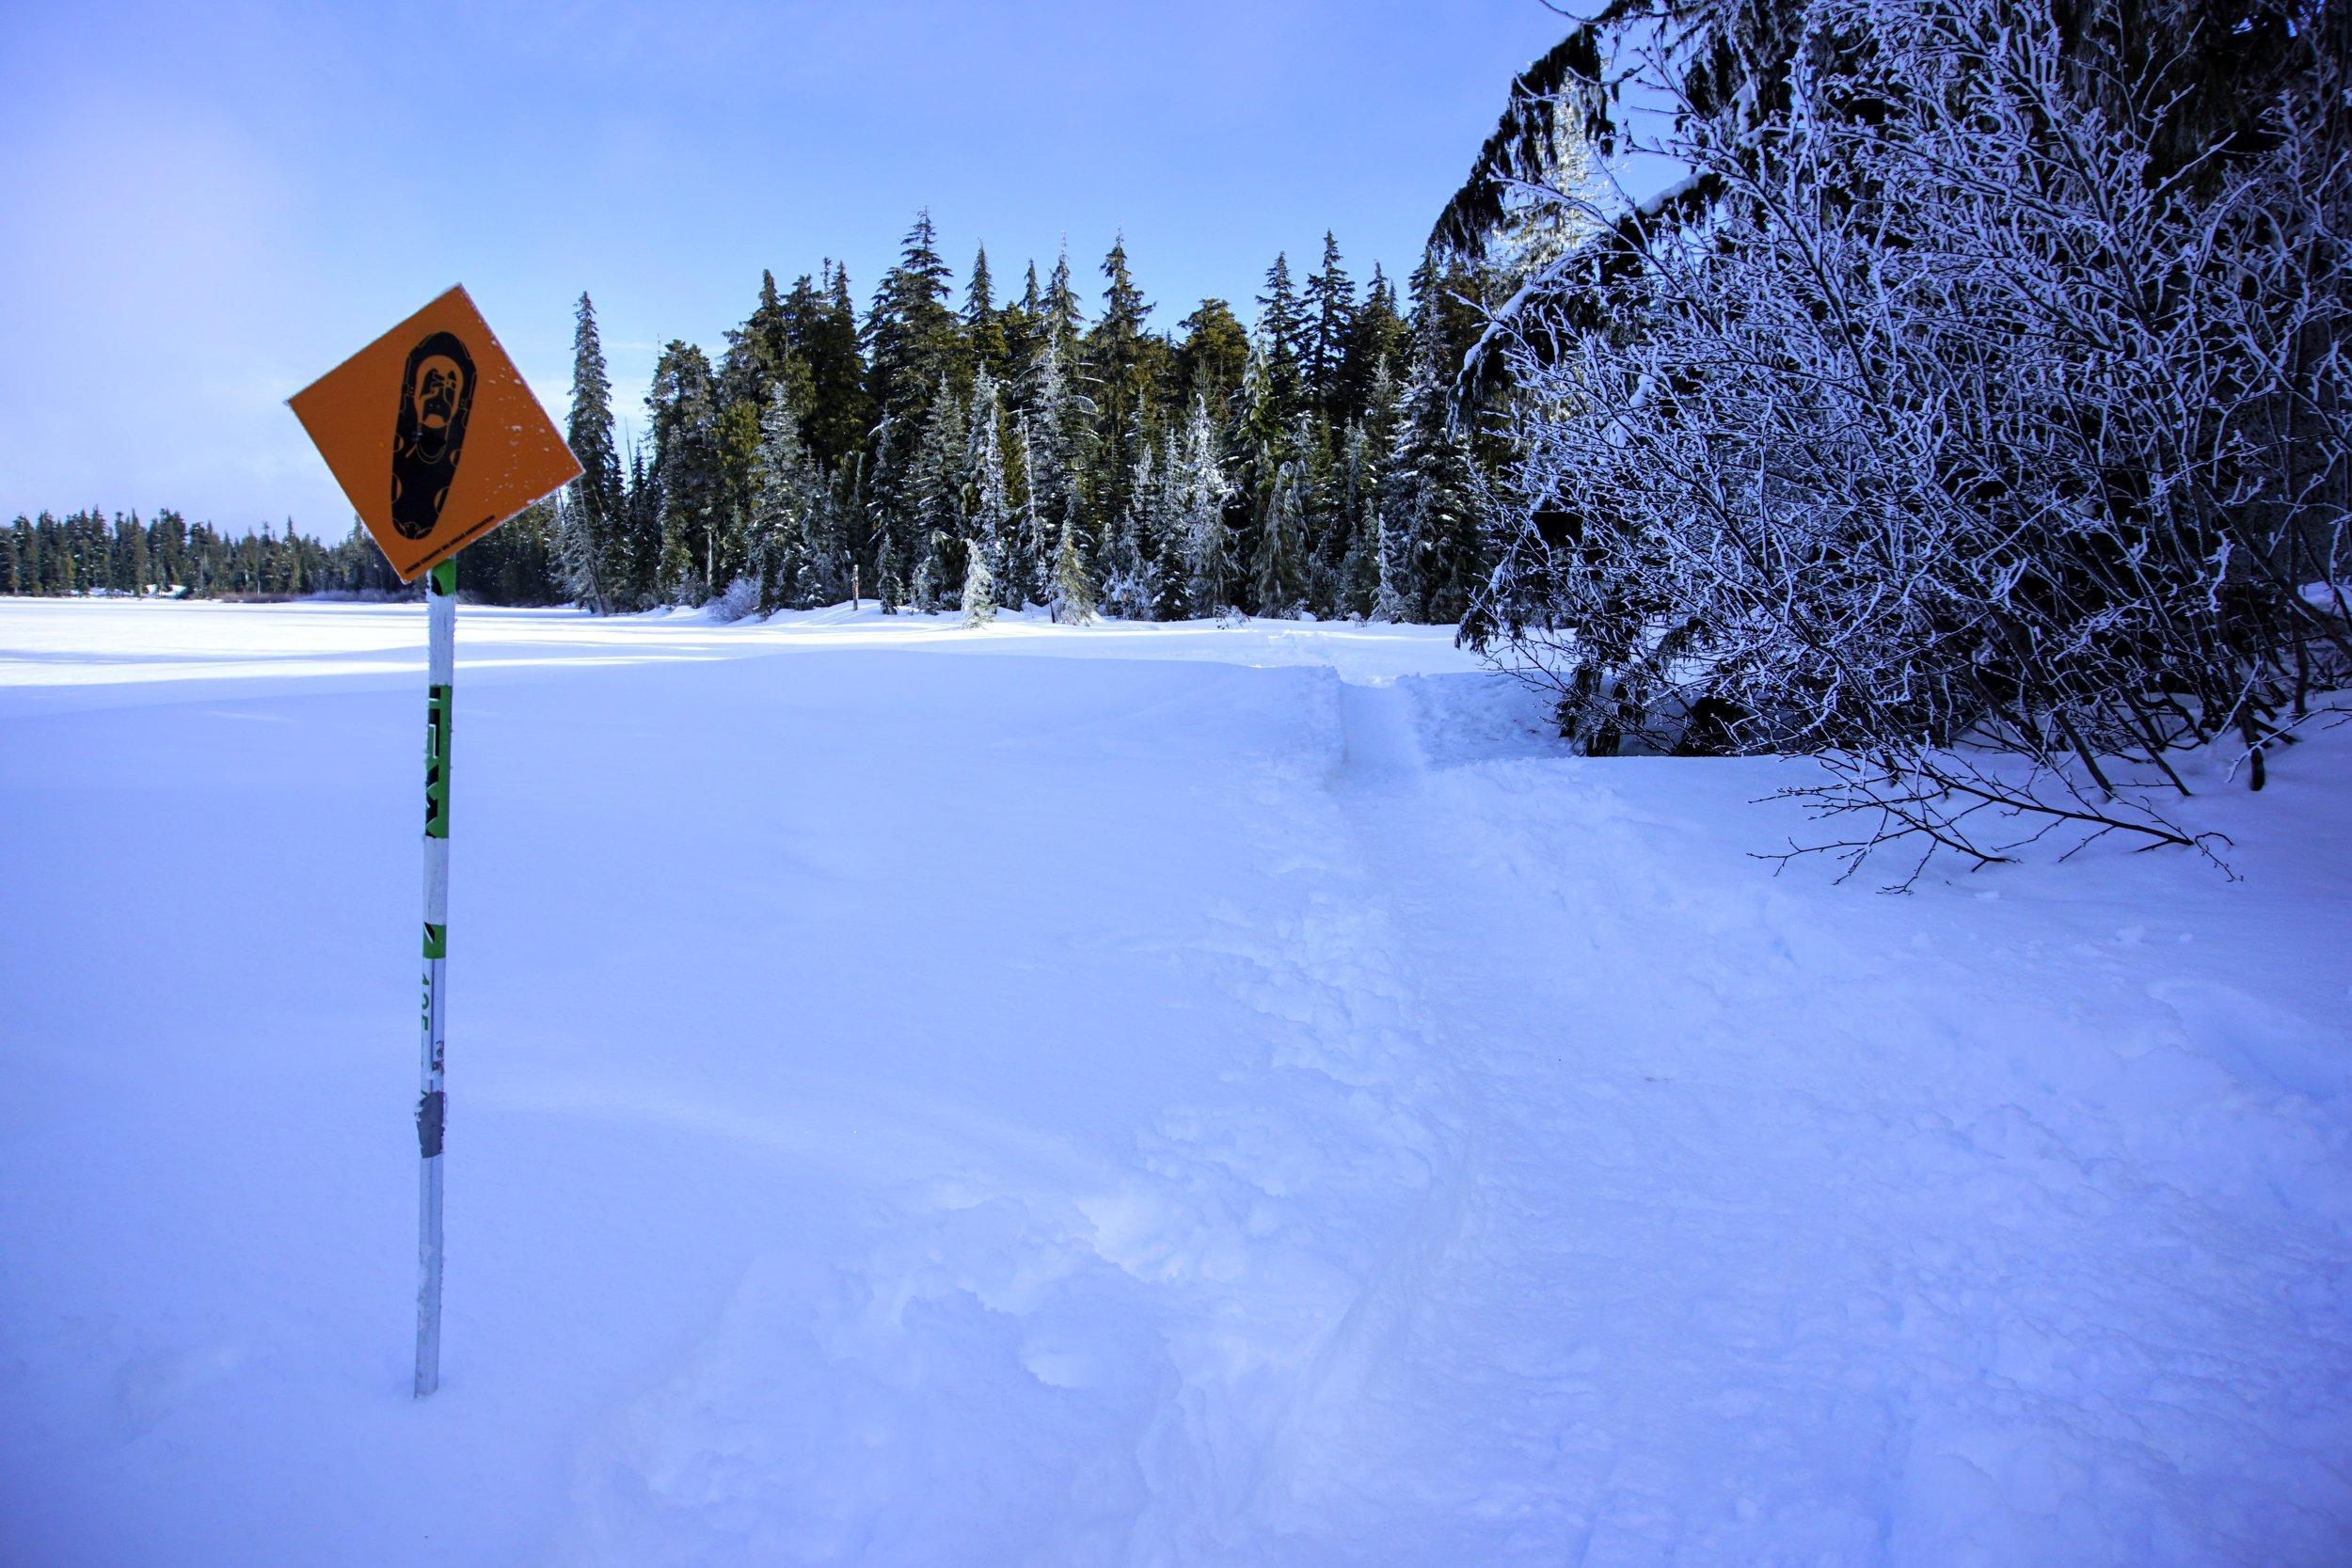 Snowshoe trail marker